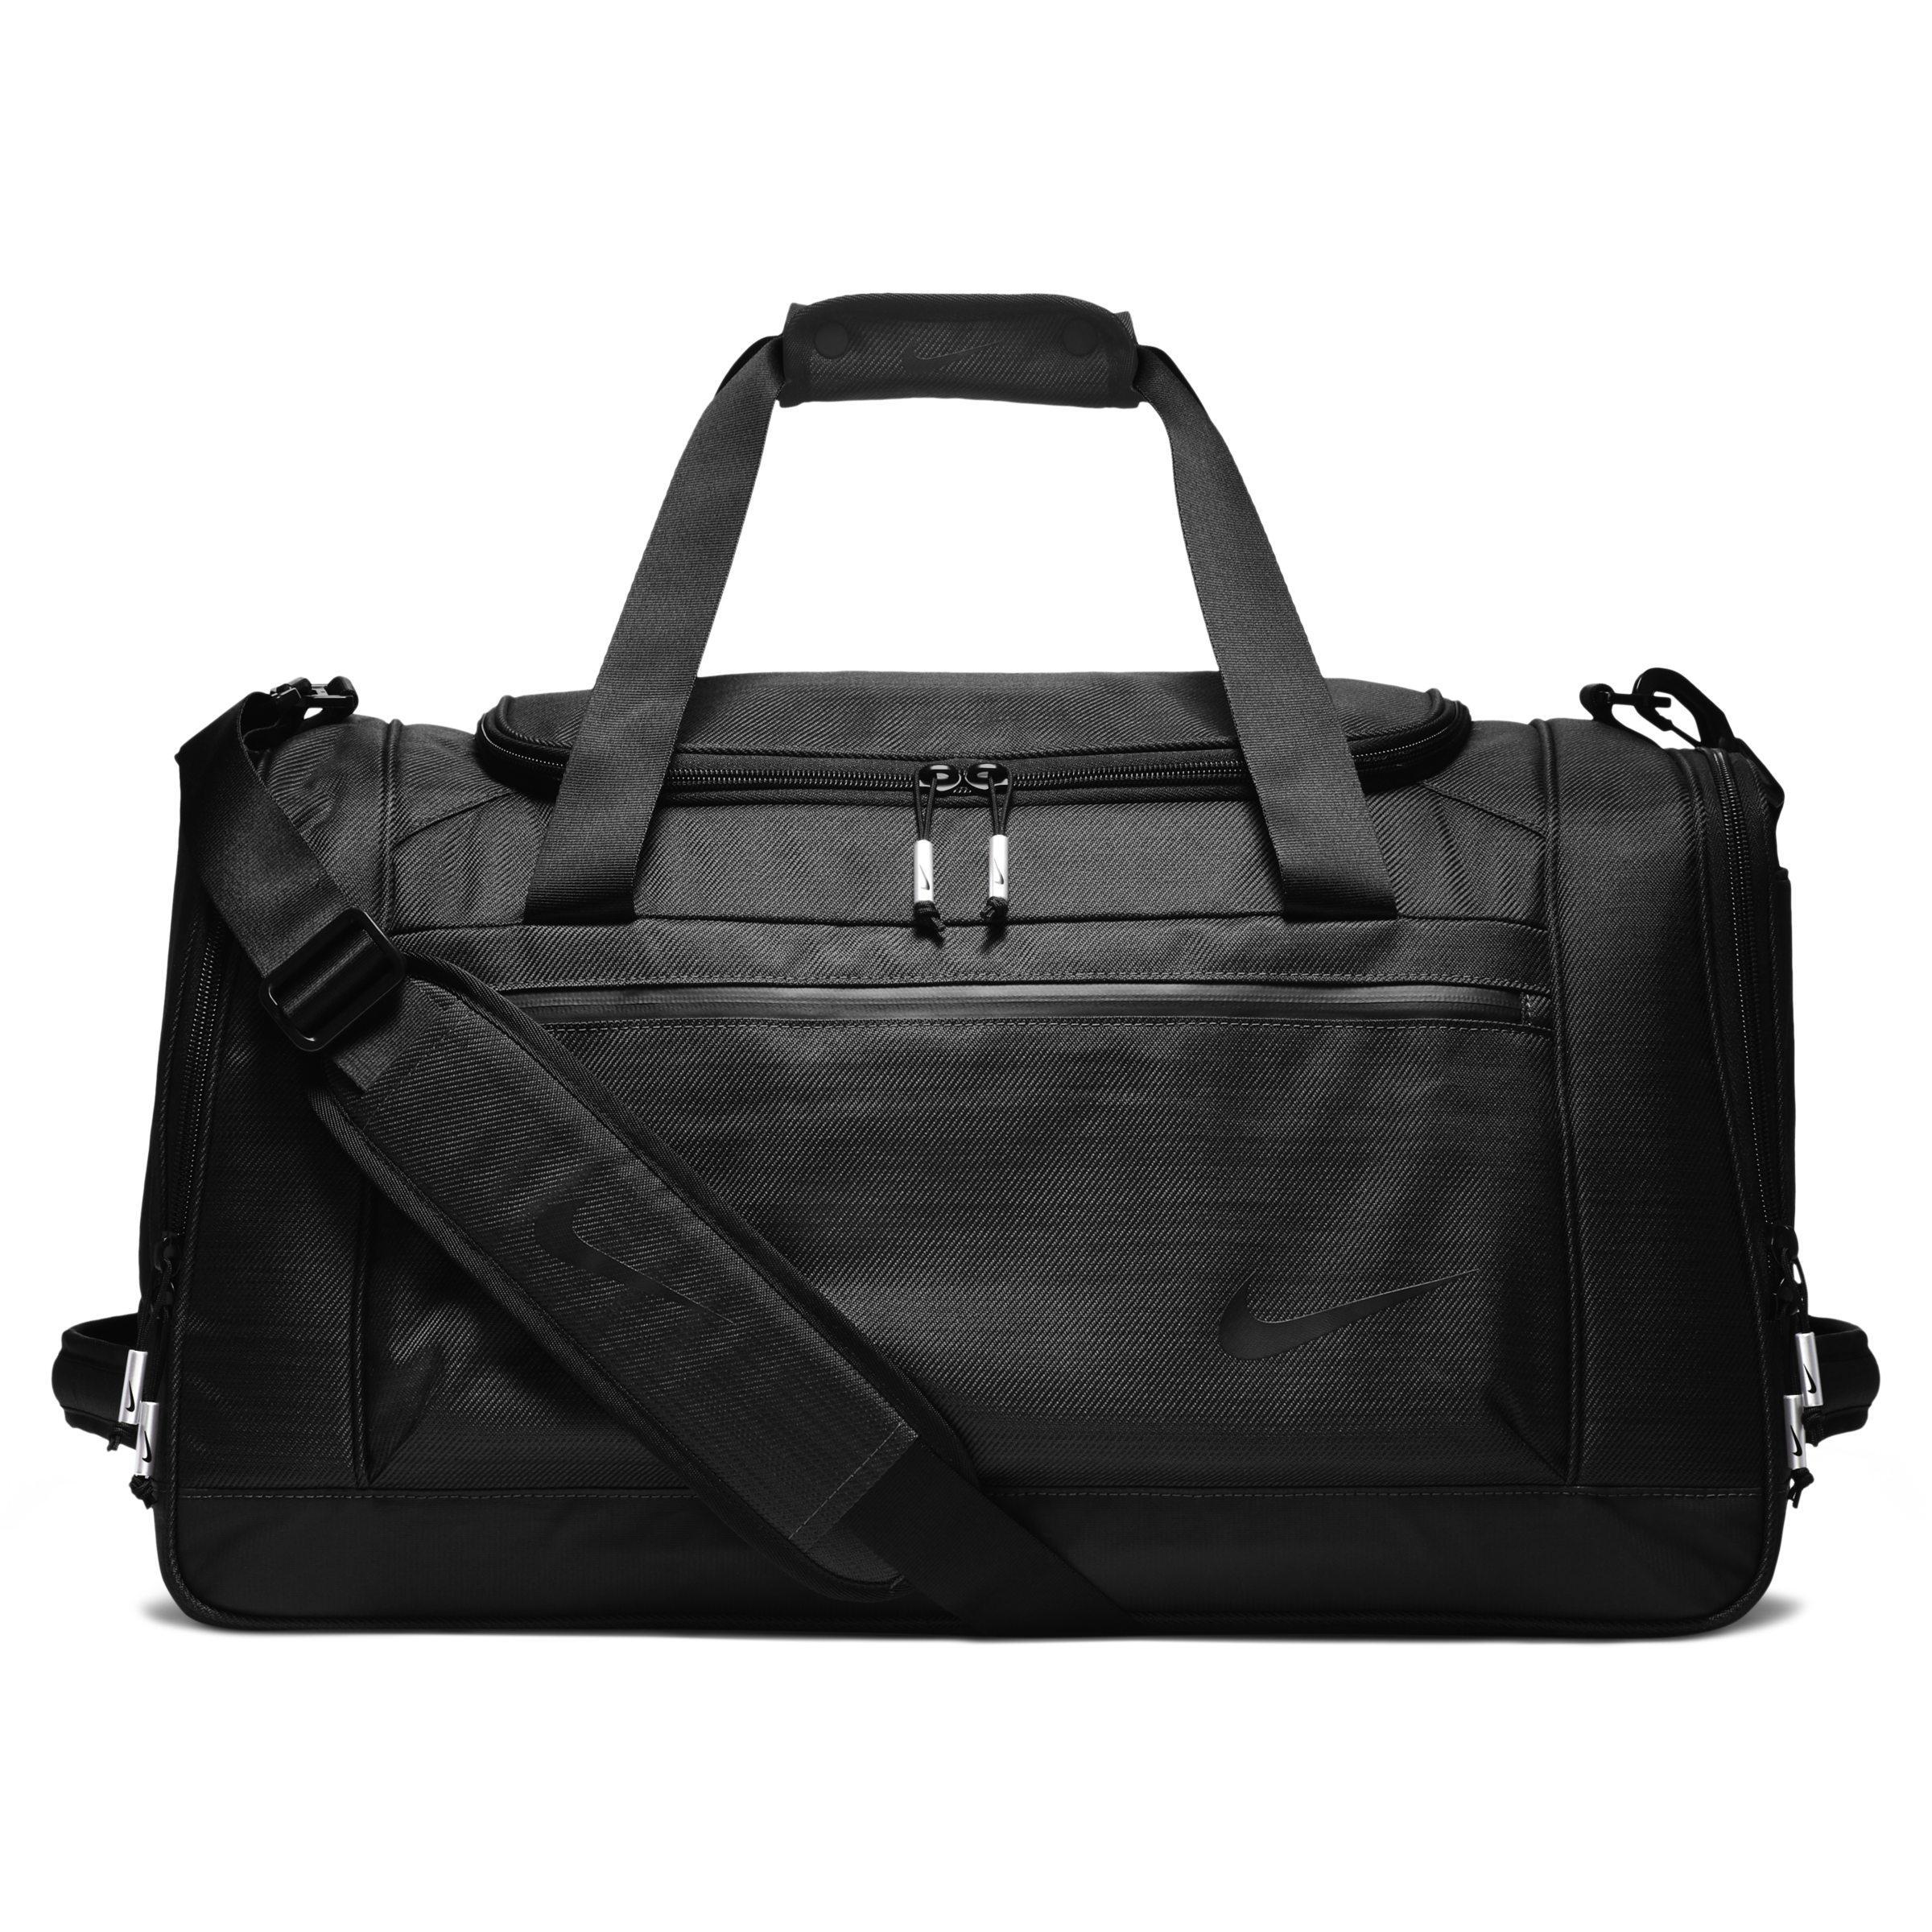 75455111061f Nike Departure Golf Duffel Bag in Black - Lyst